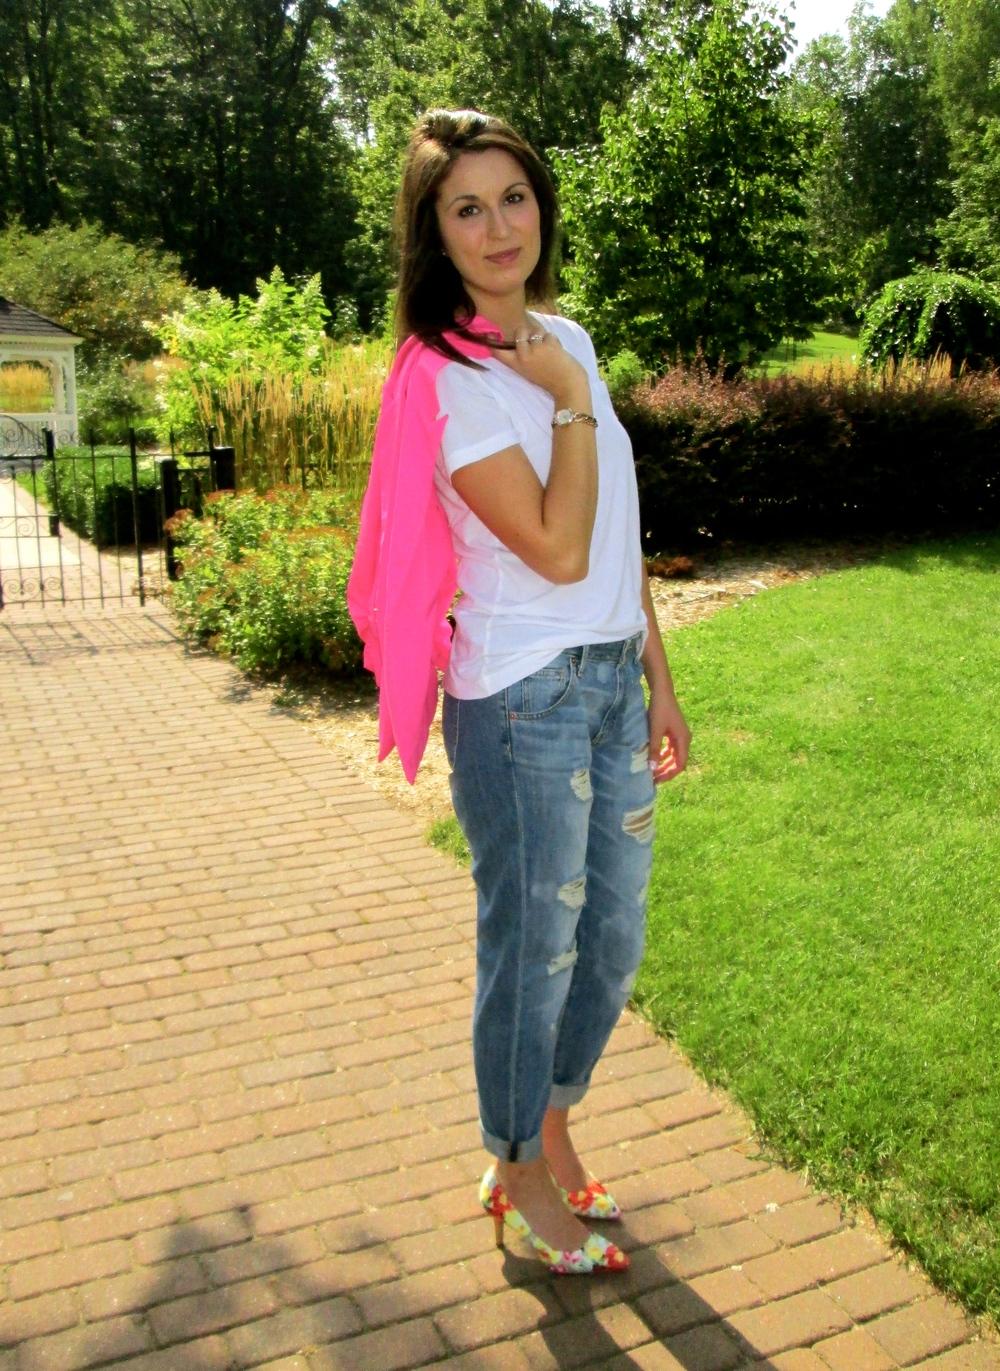 PinkBlazer2